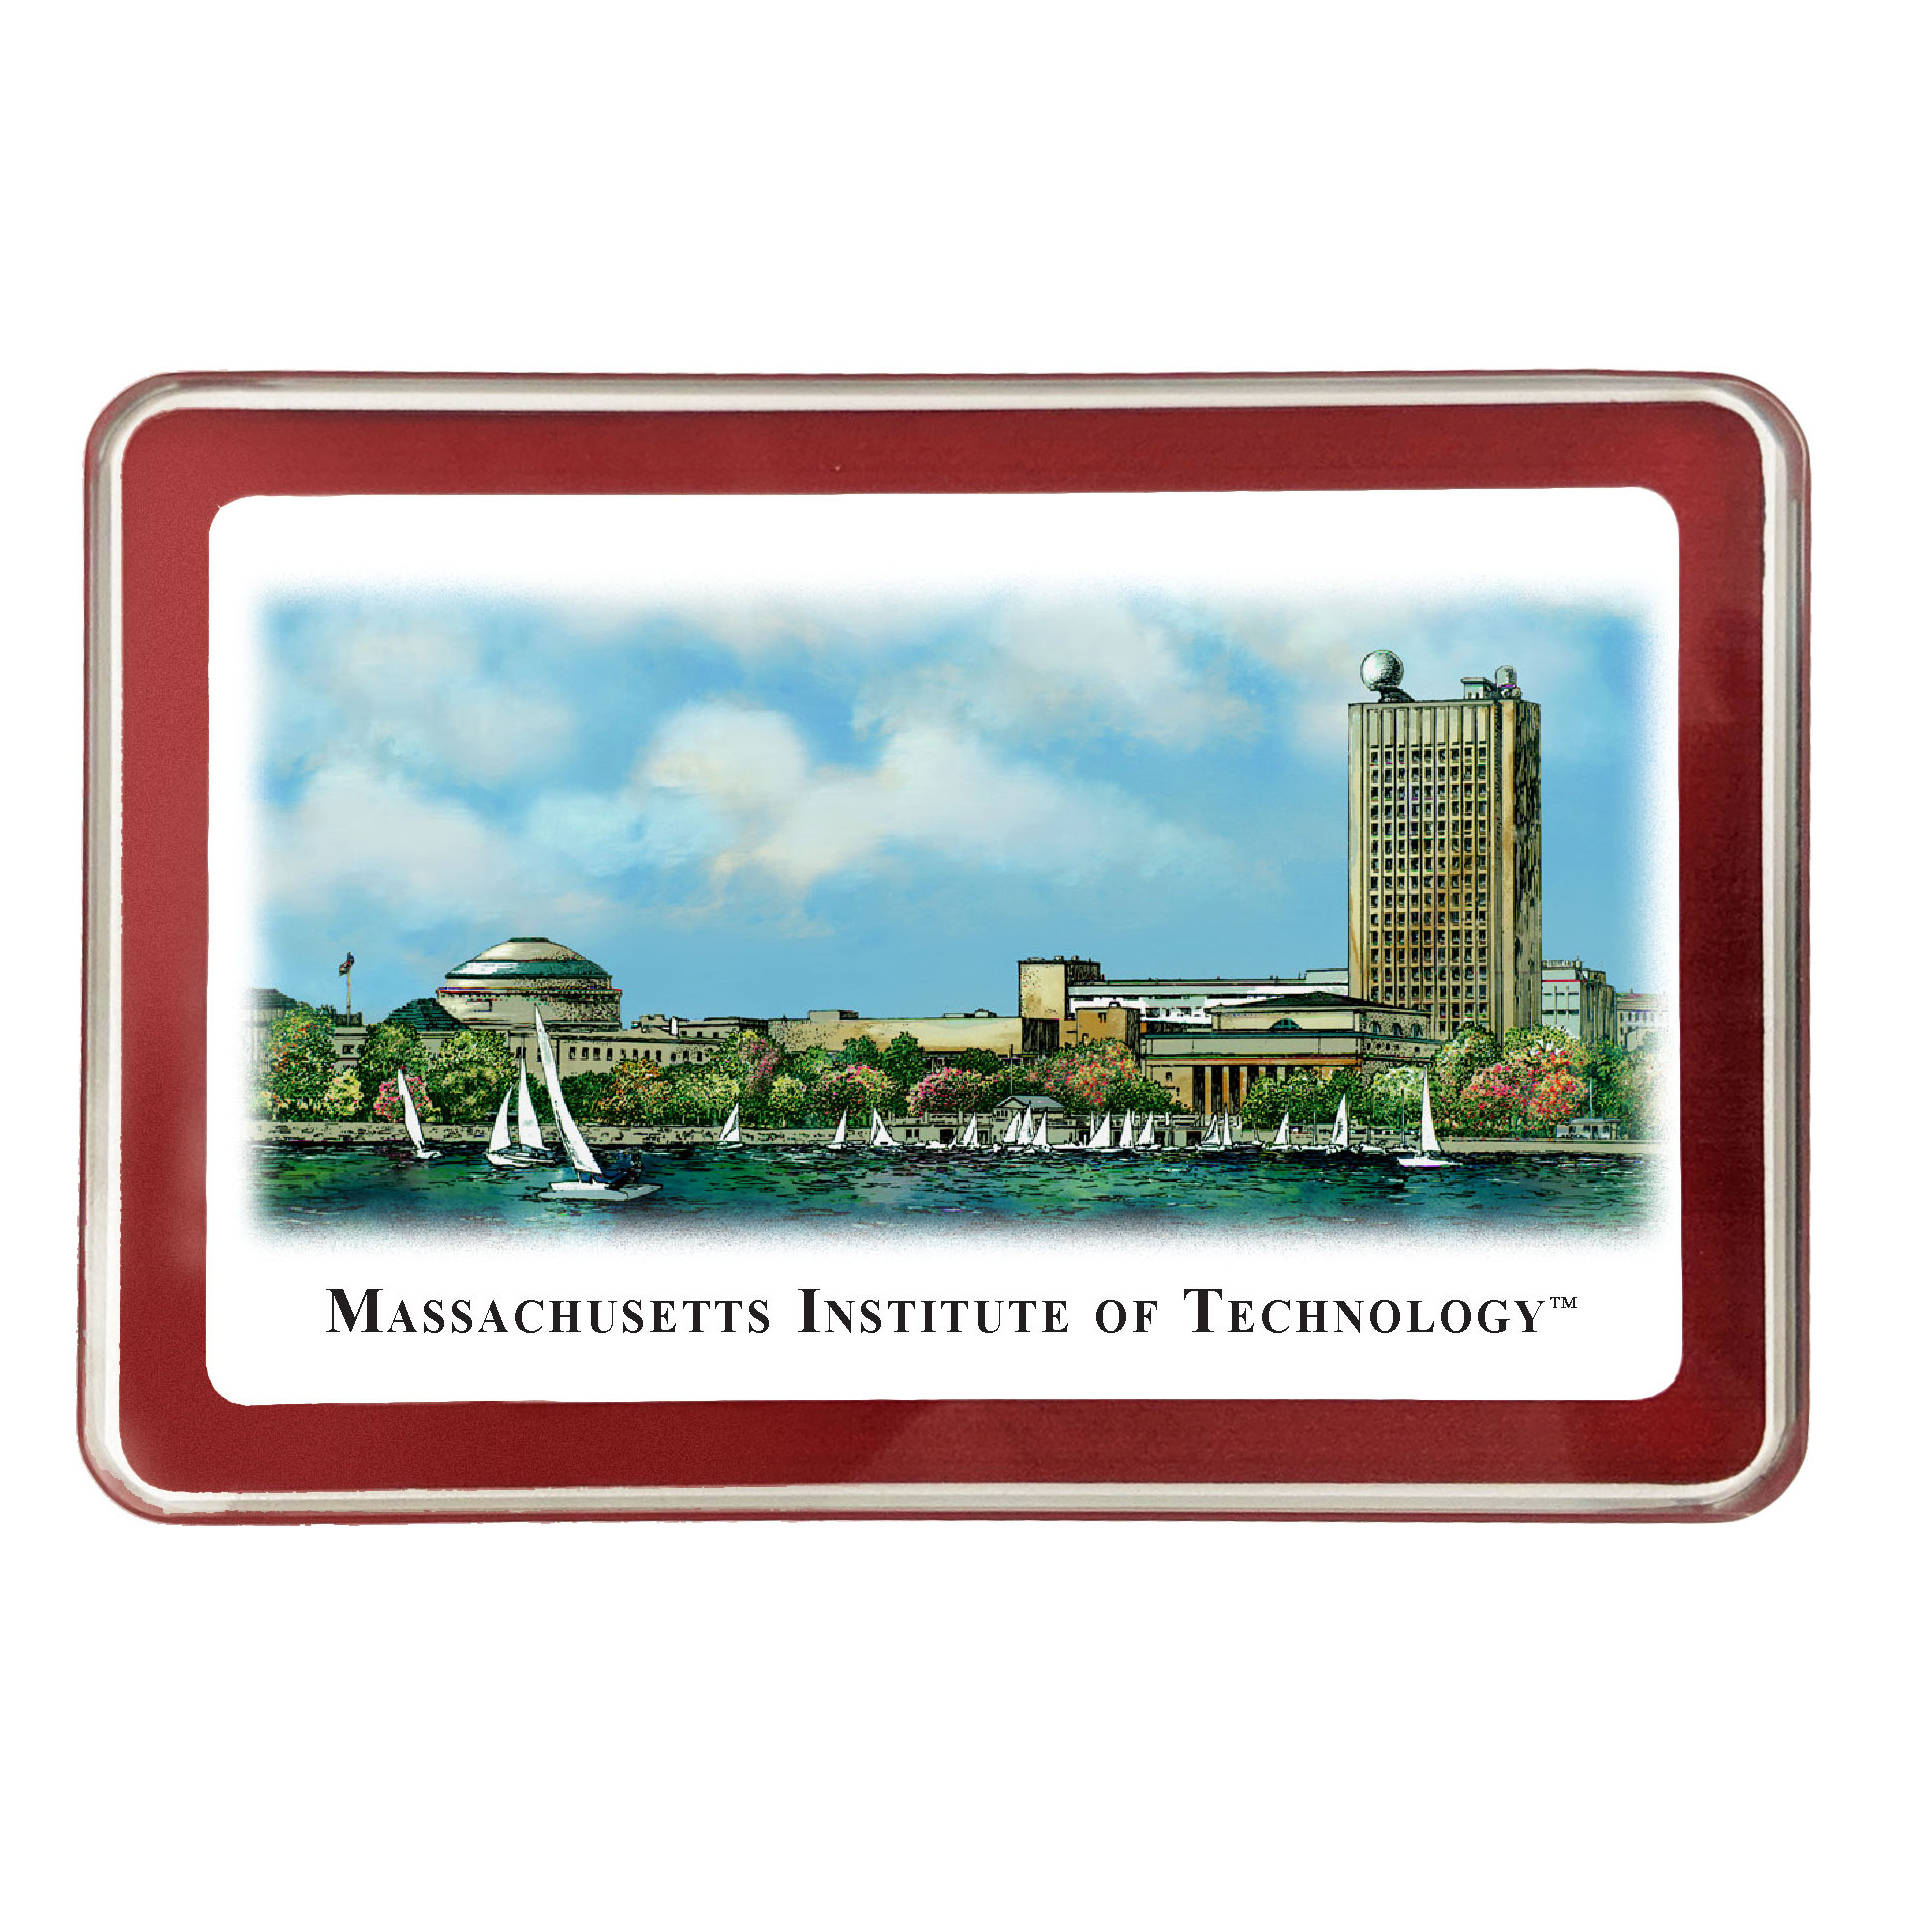 MIT Eglomise Paperweight